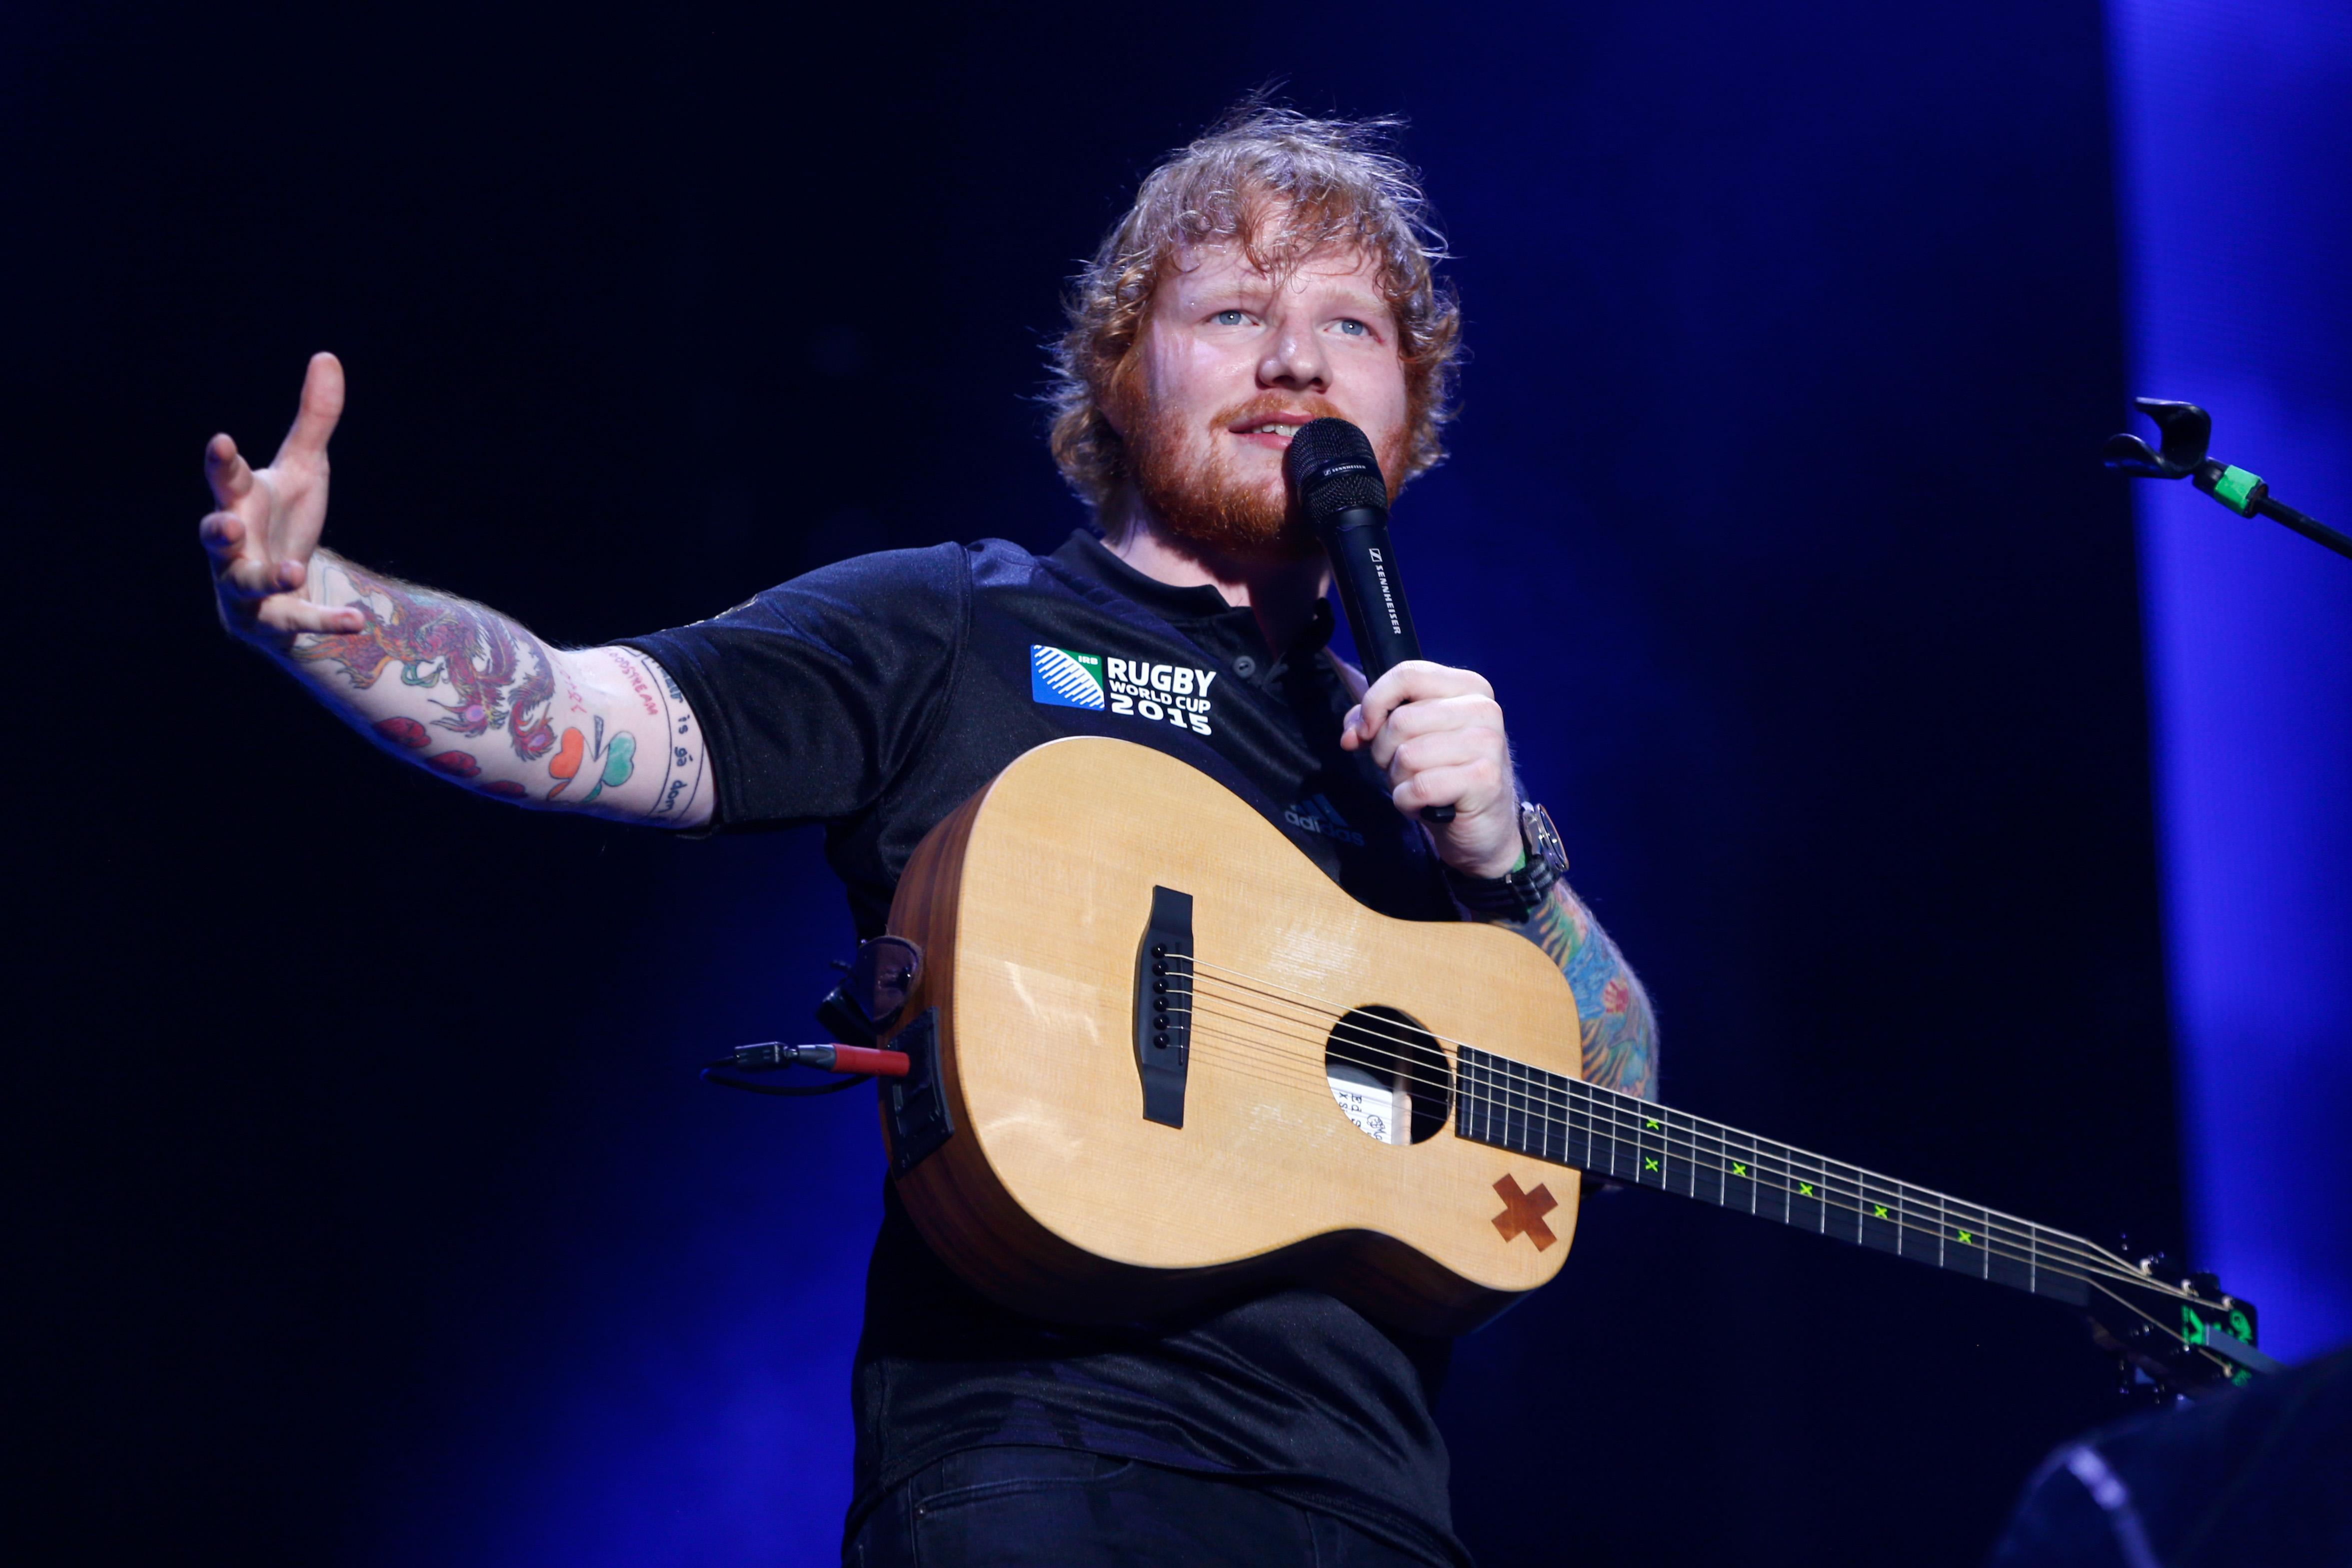 Ed Sheeran performs at Mt Smart Stadium on Dec. 12, 2015 in Auckland, New Zealand.